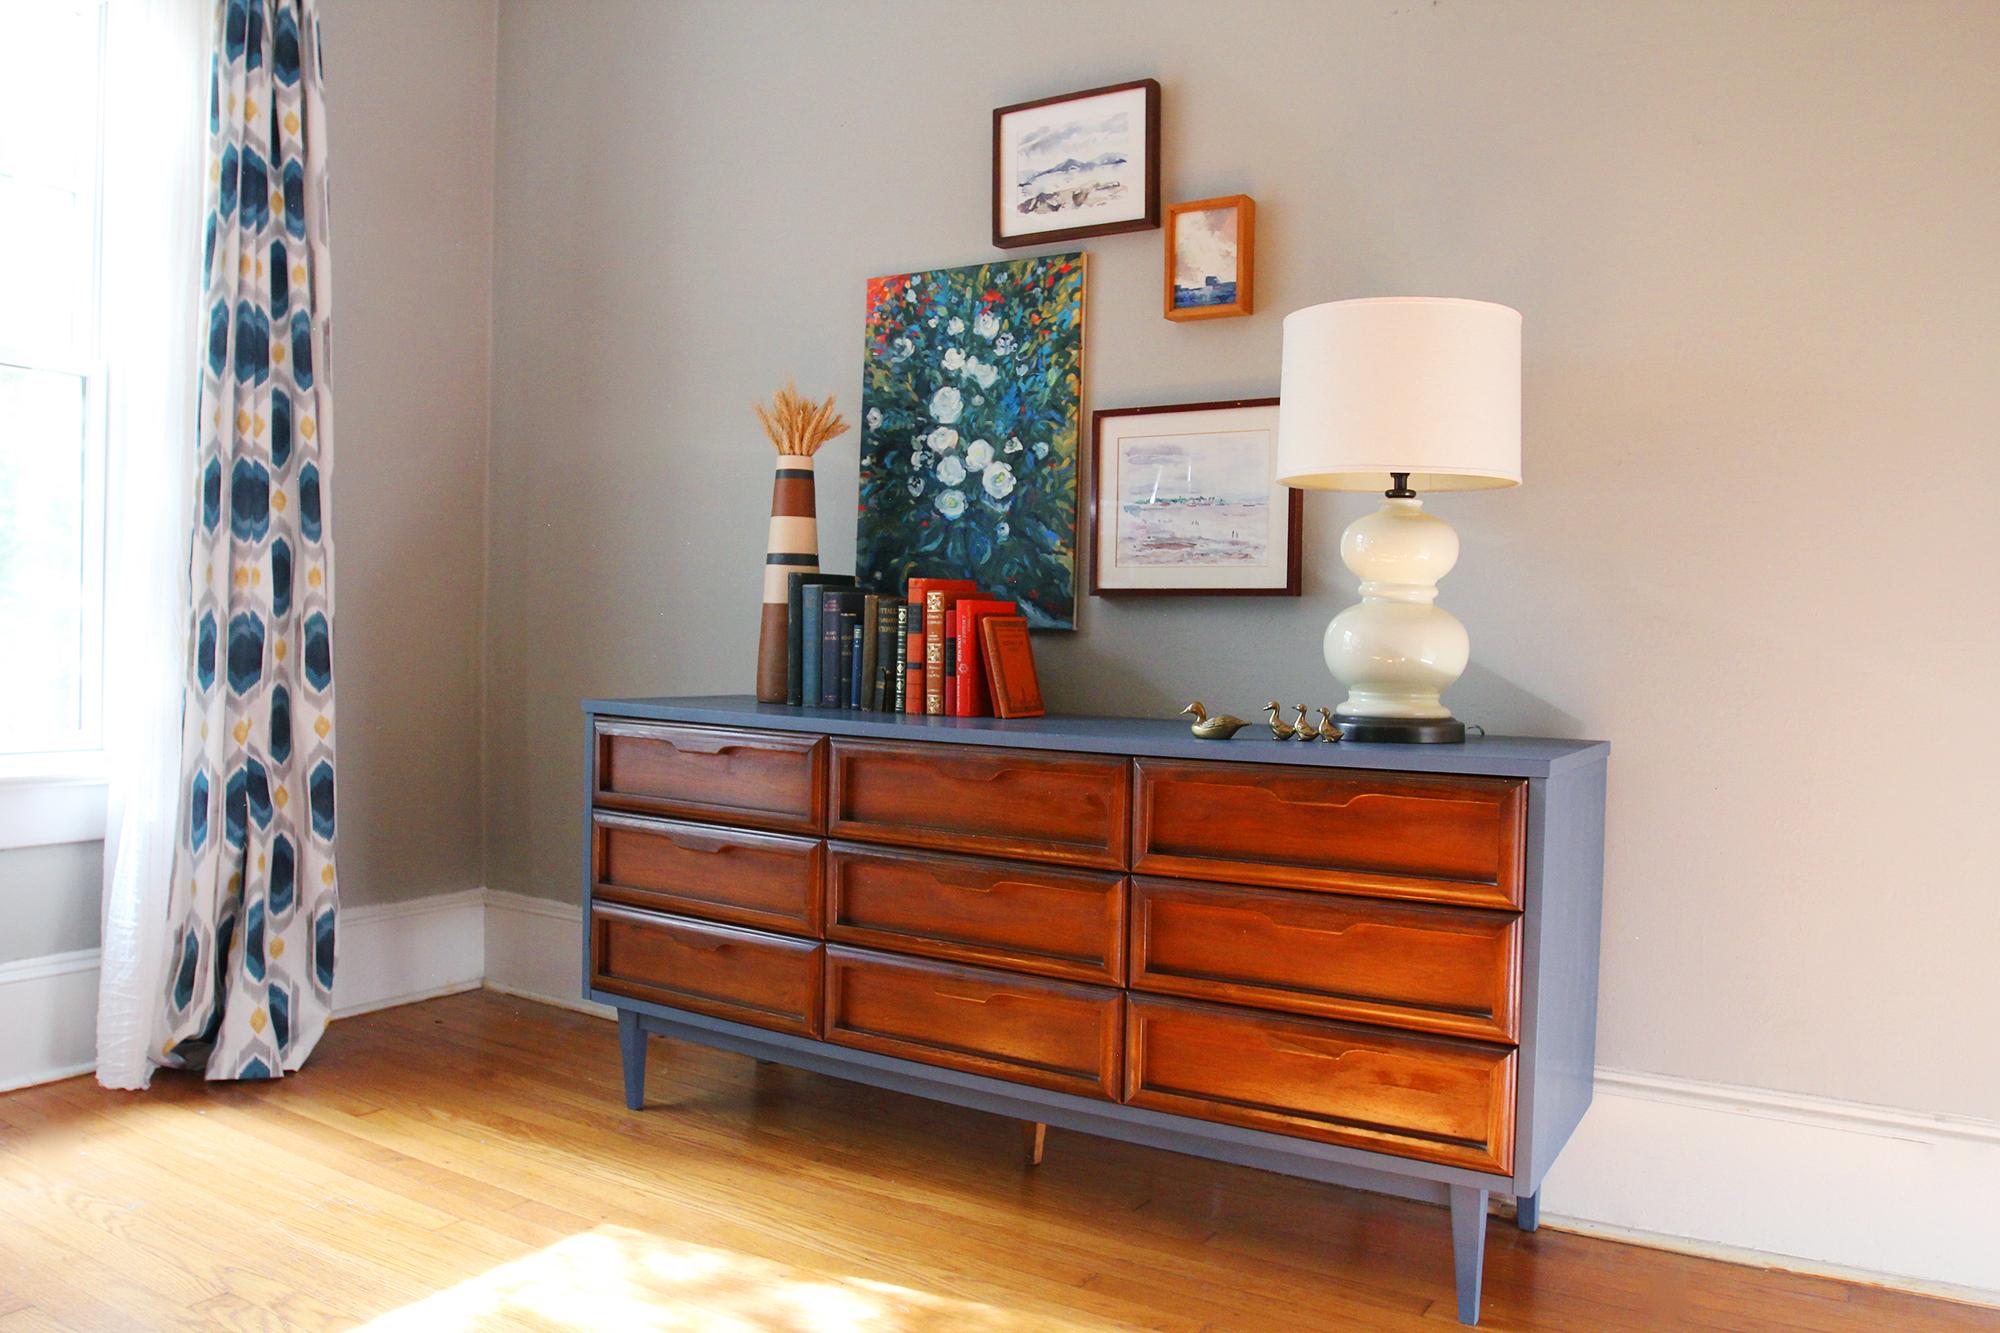 jo-torrijos-a-simpler-design-atlanta-painted-furniture-annie-sloan-aubusson-blue-french-linen-mid-century-painted-dresser-13.jpg